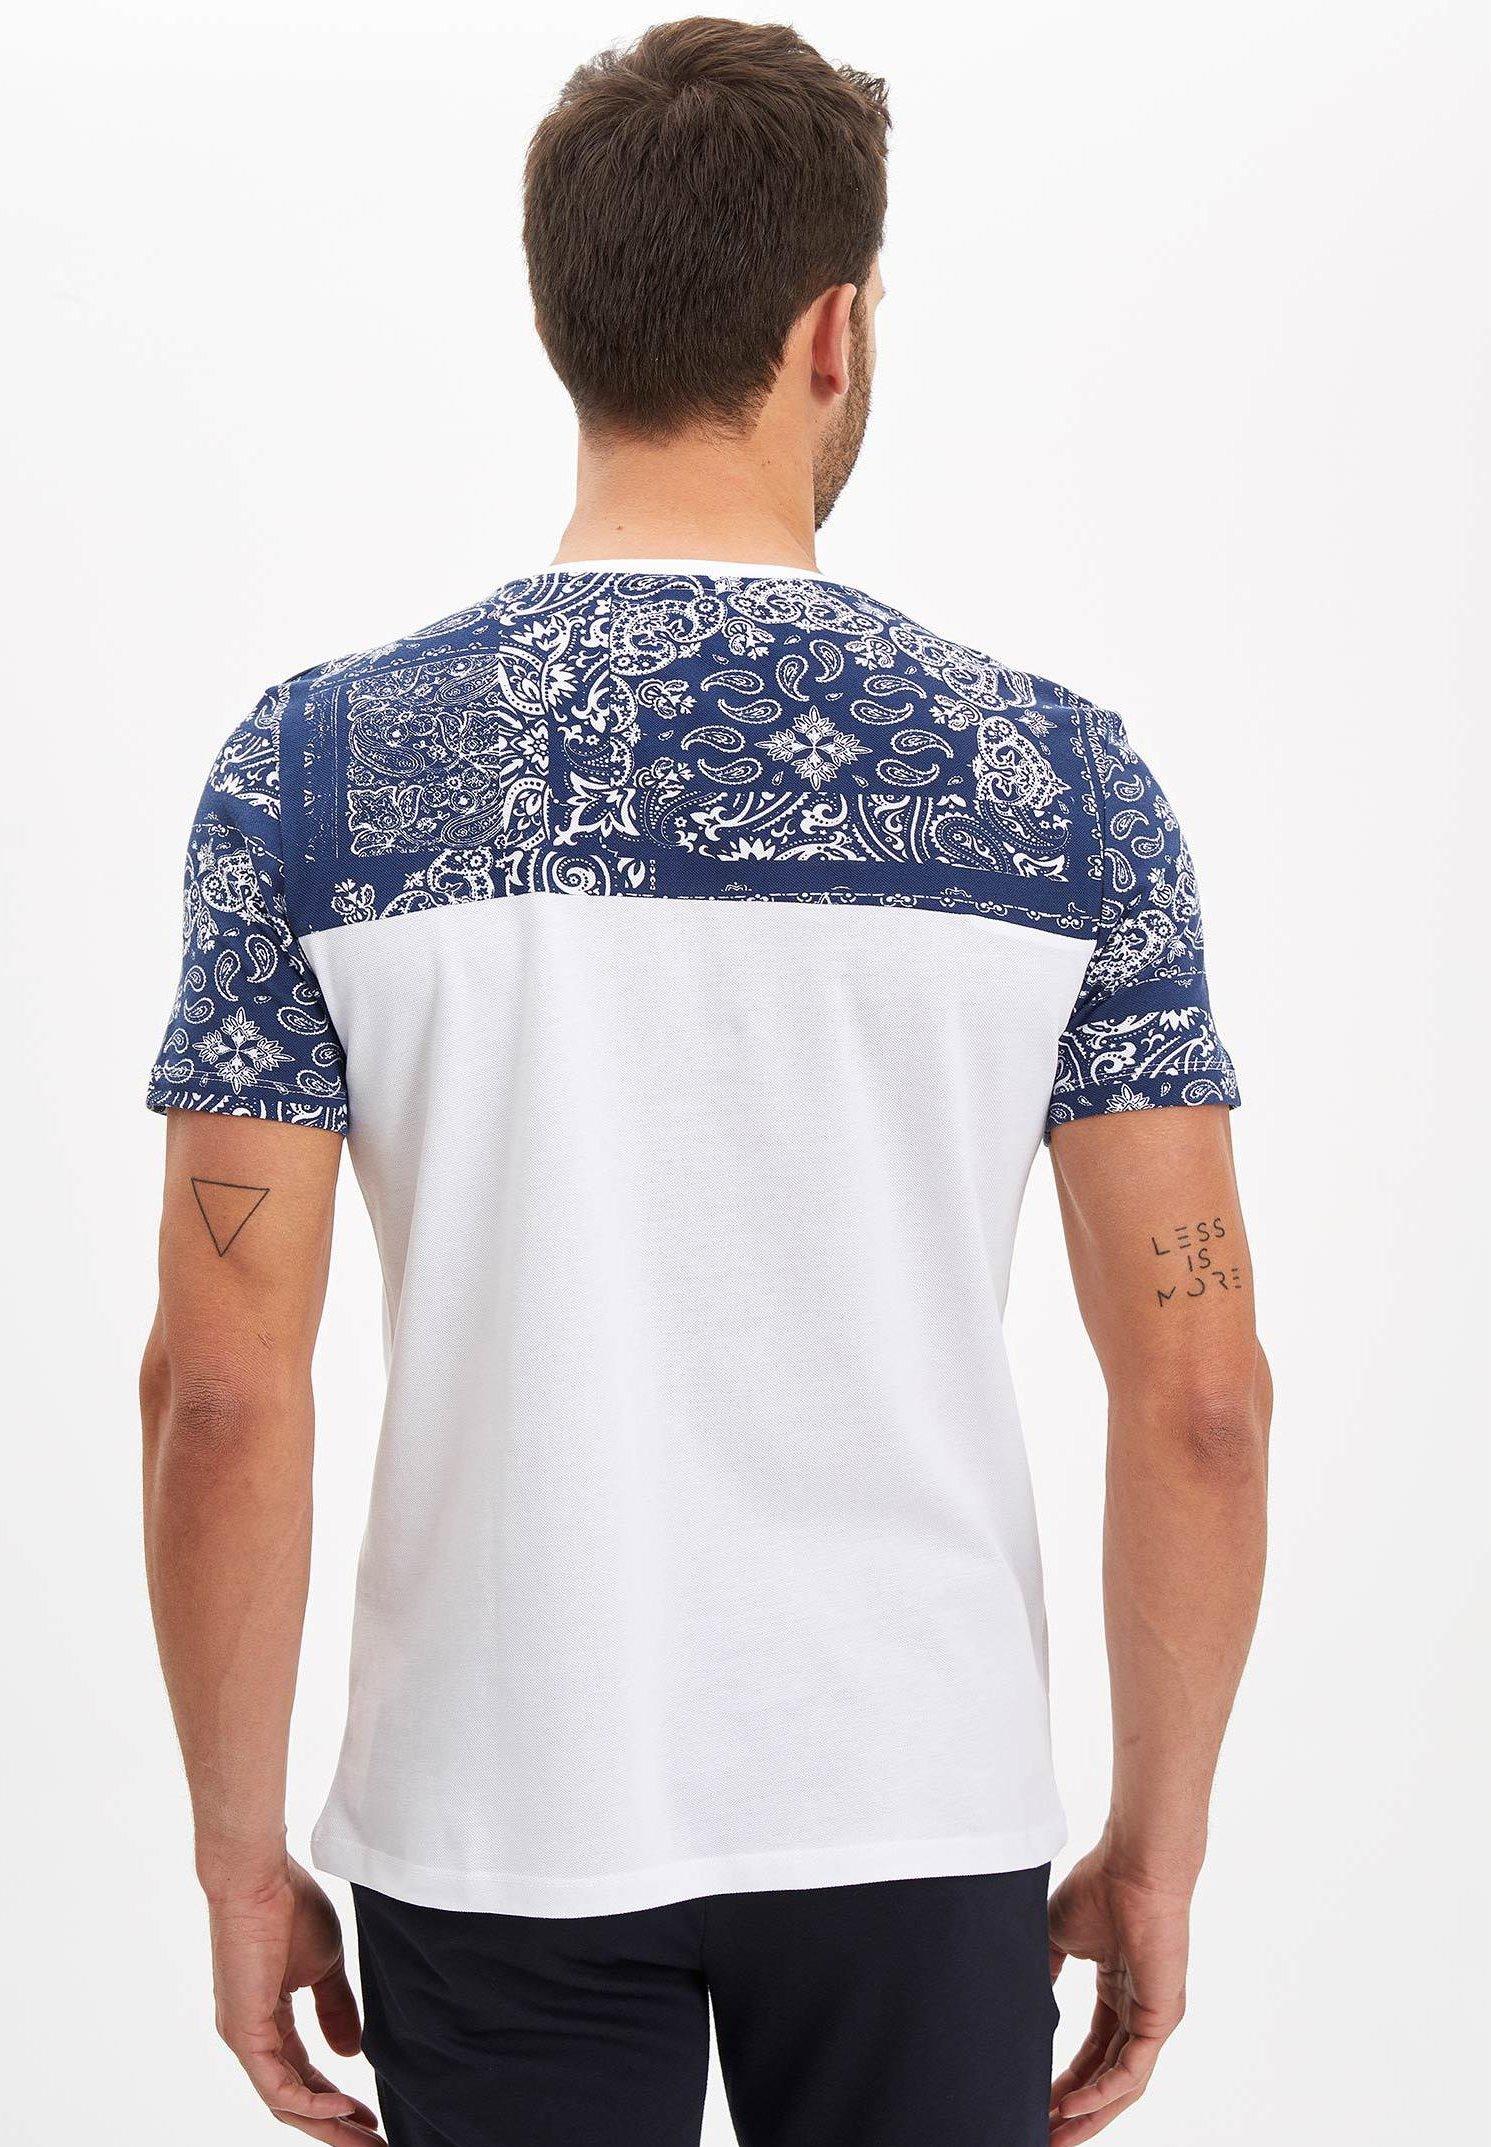 DeFacto Print T-shirt - white 1iUTt